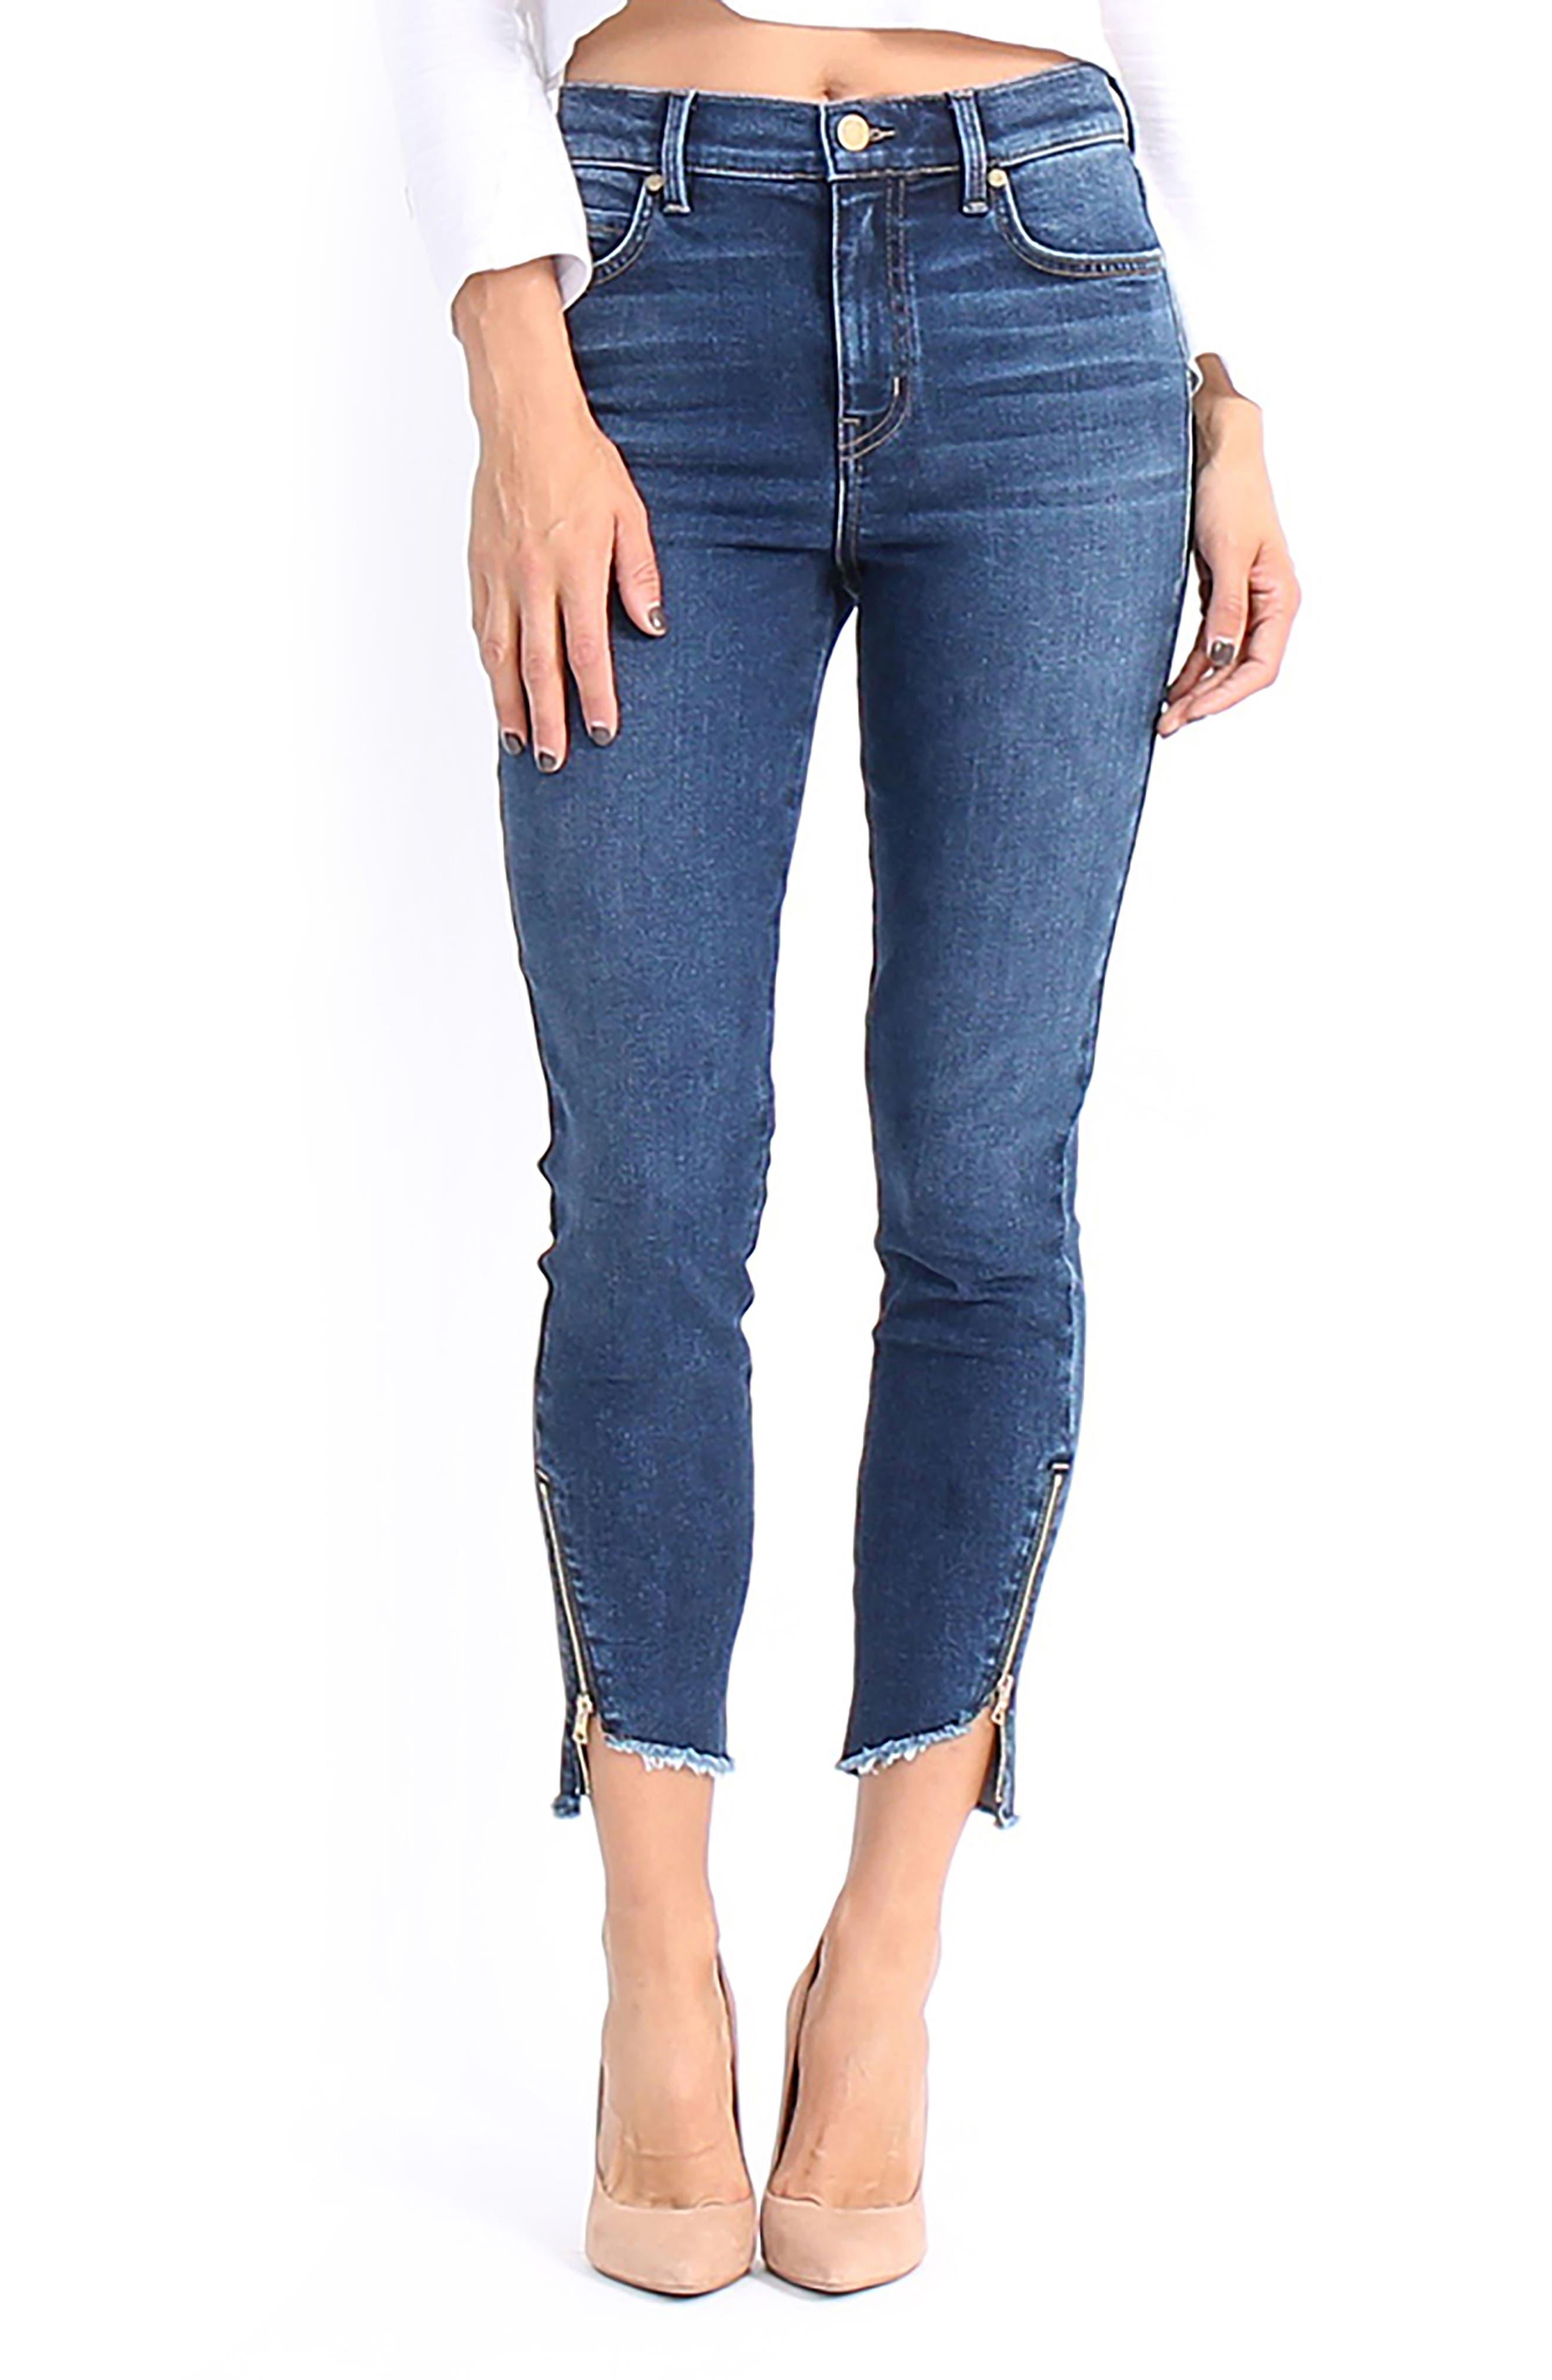 Alternate Image 1 Selected - Level 99 Ellie Uneven Zip Slant Hem Jeans (Women)